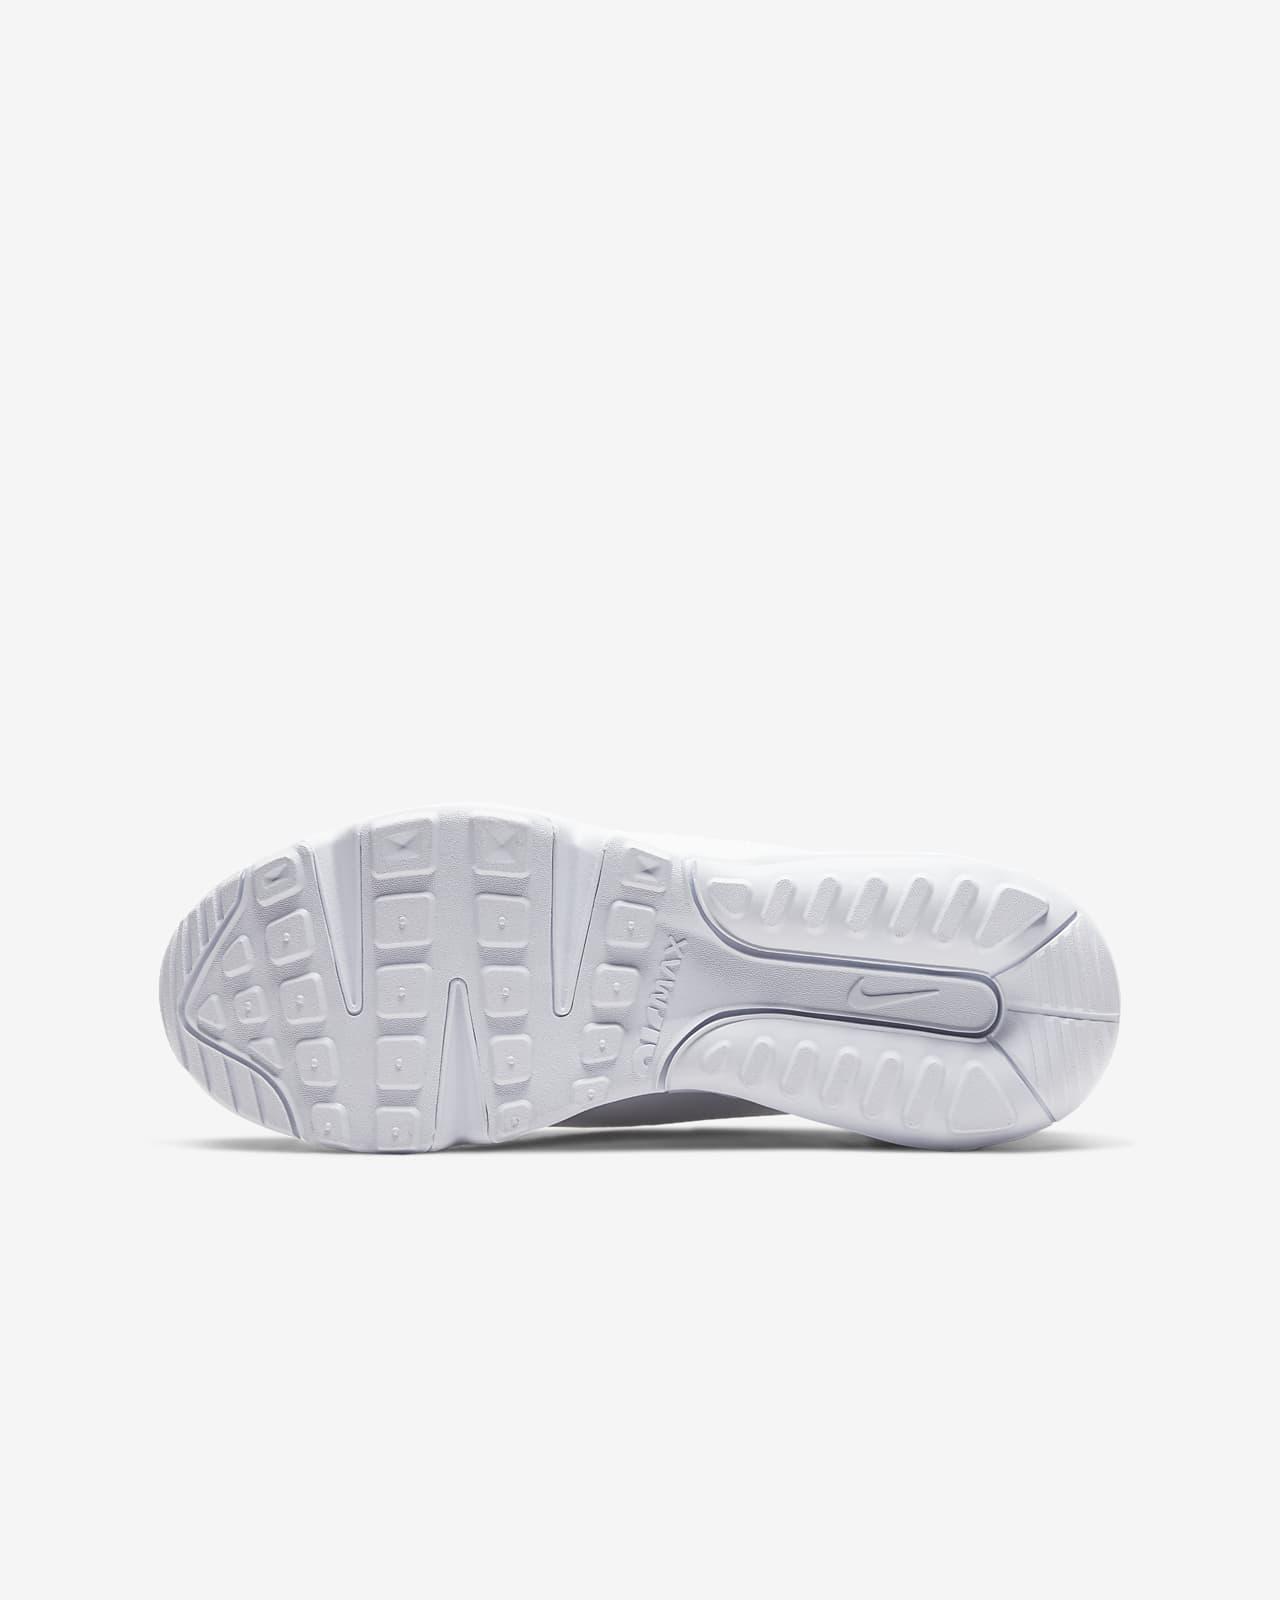 mini chaussure pour doigt nike